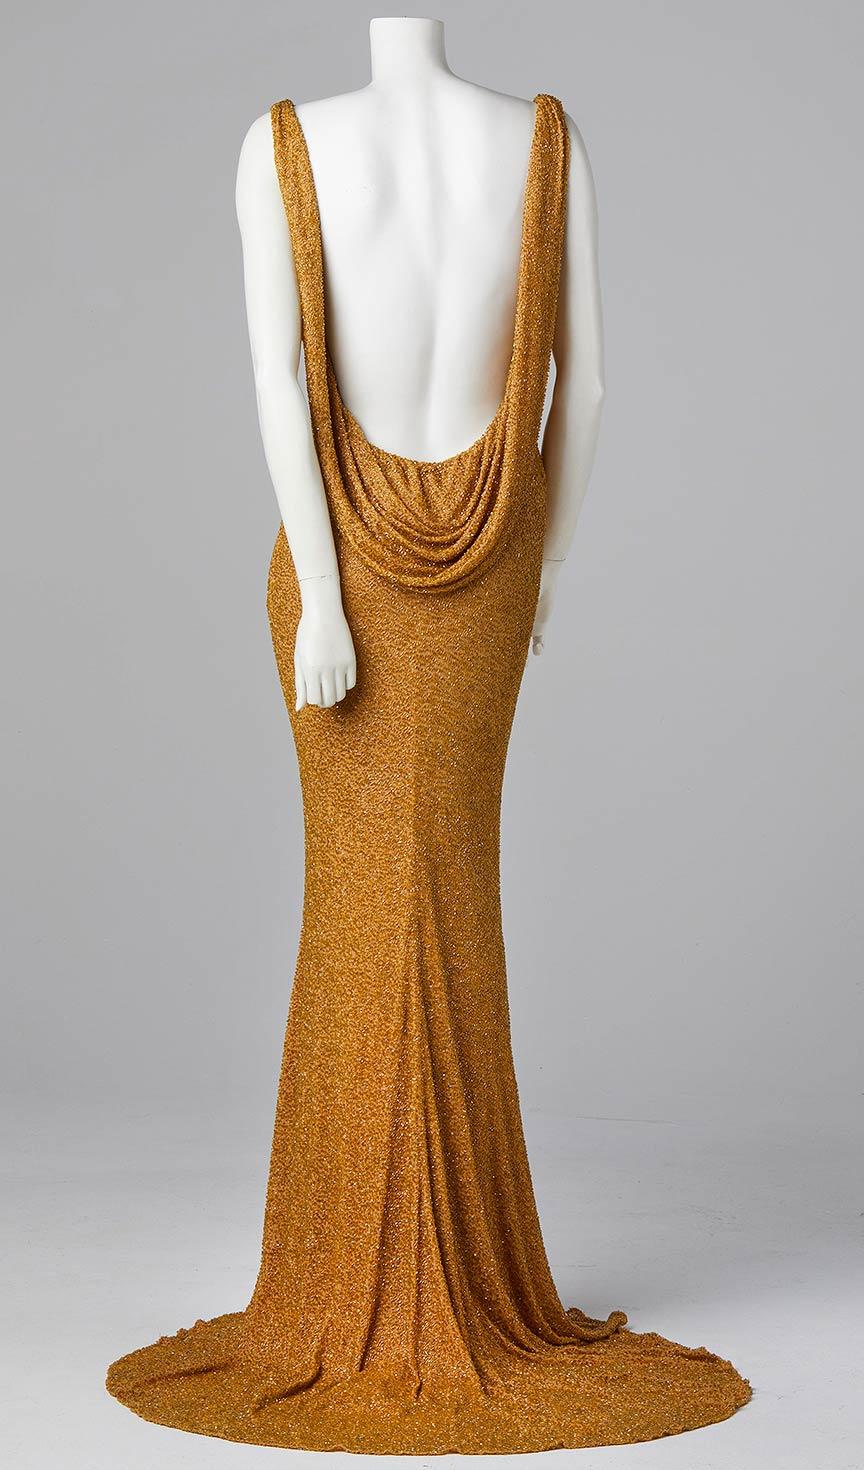 gold beaded silk evening dress awards dress couture bespoke designer allison rodger